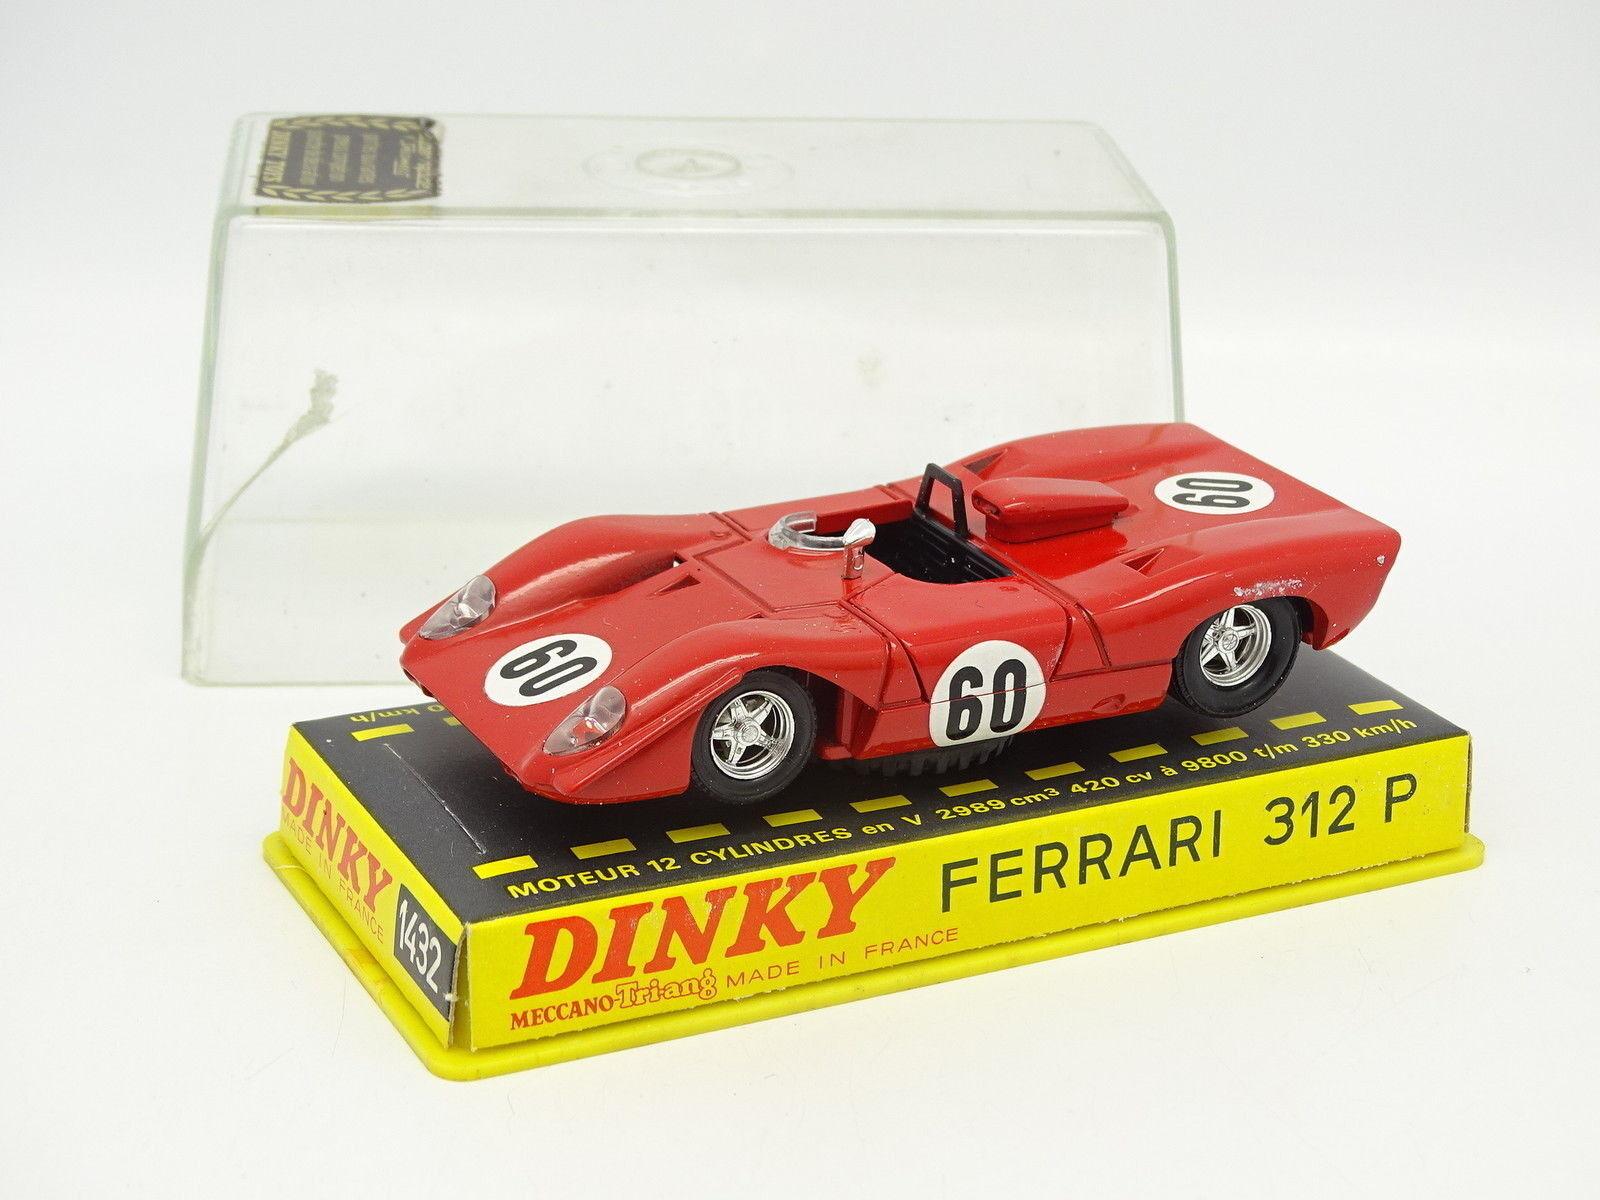 Dinky Toys France 1 43 - Ferrari 312 P 1432